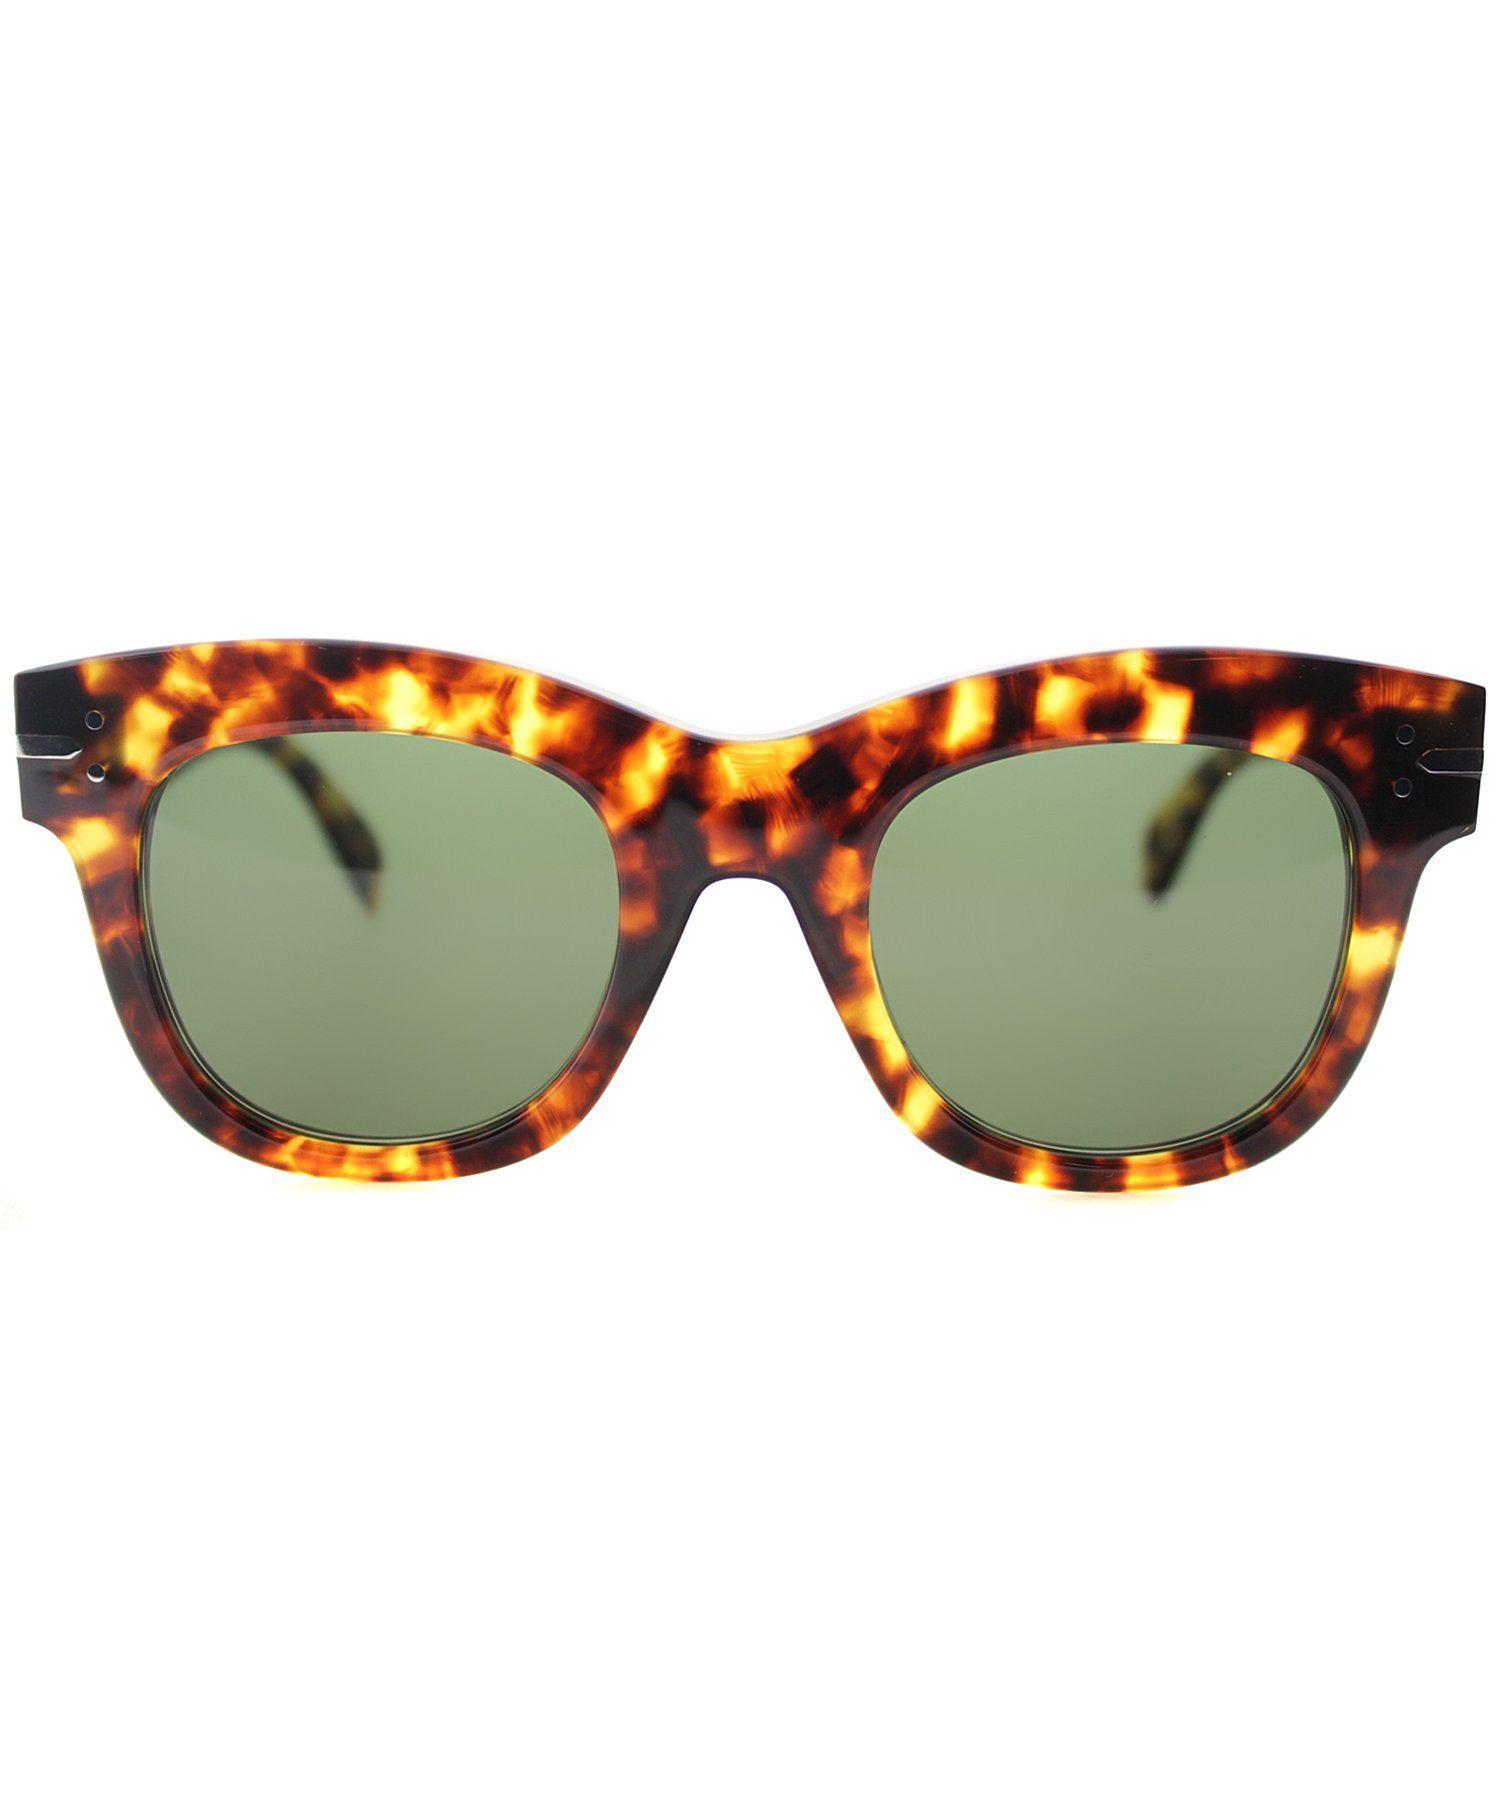 401a412f0641 The Celine Celine CL 41079 E88 Blonde Tortoise Round Plastic Sunglasses at  Bluefly.